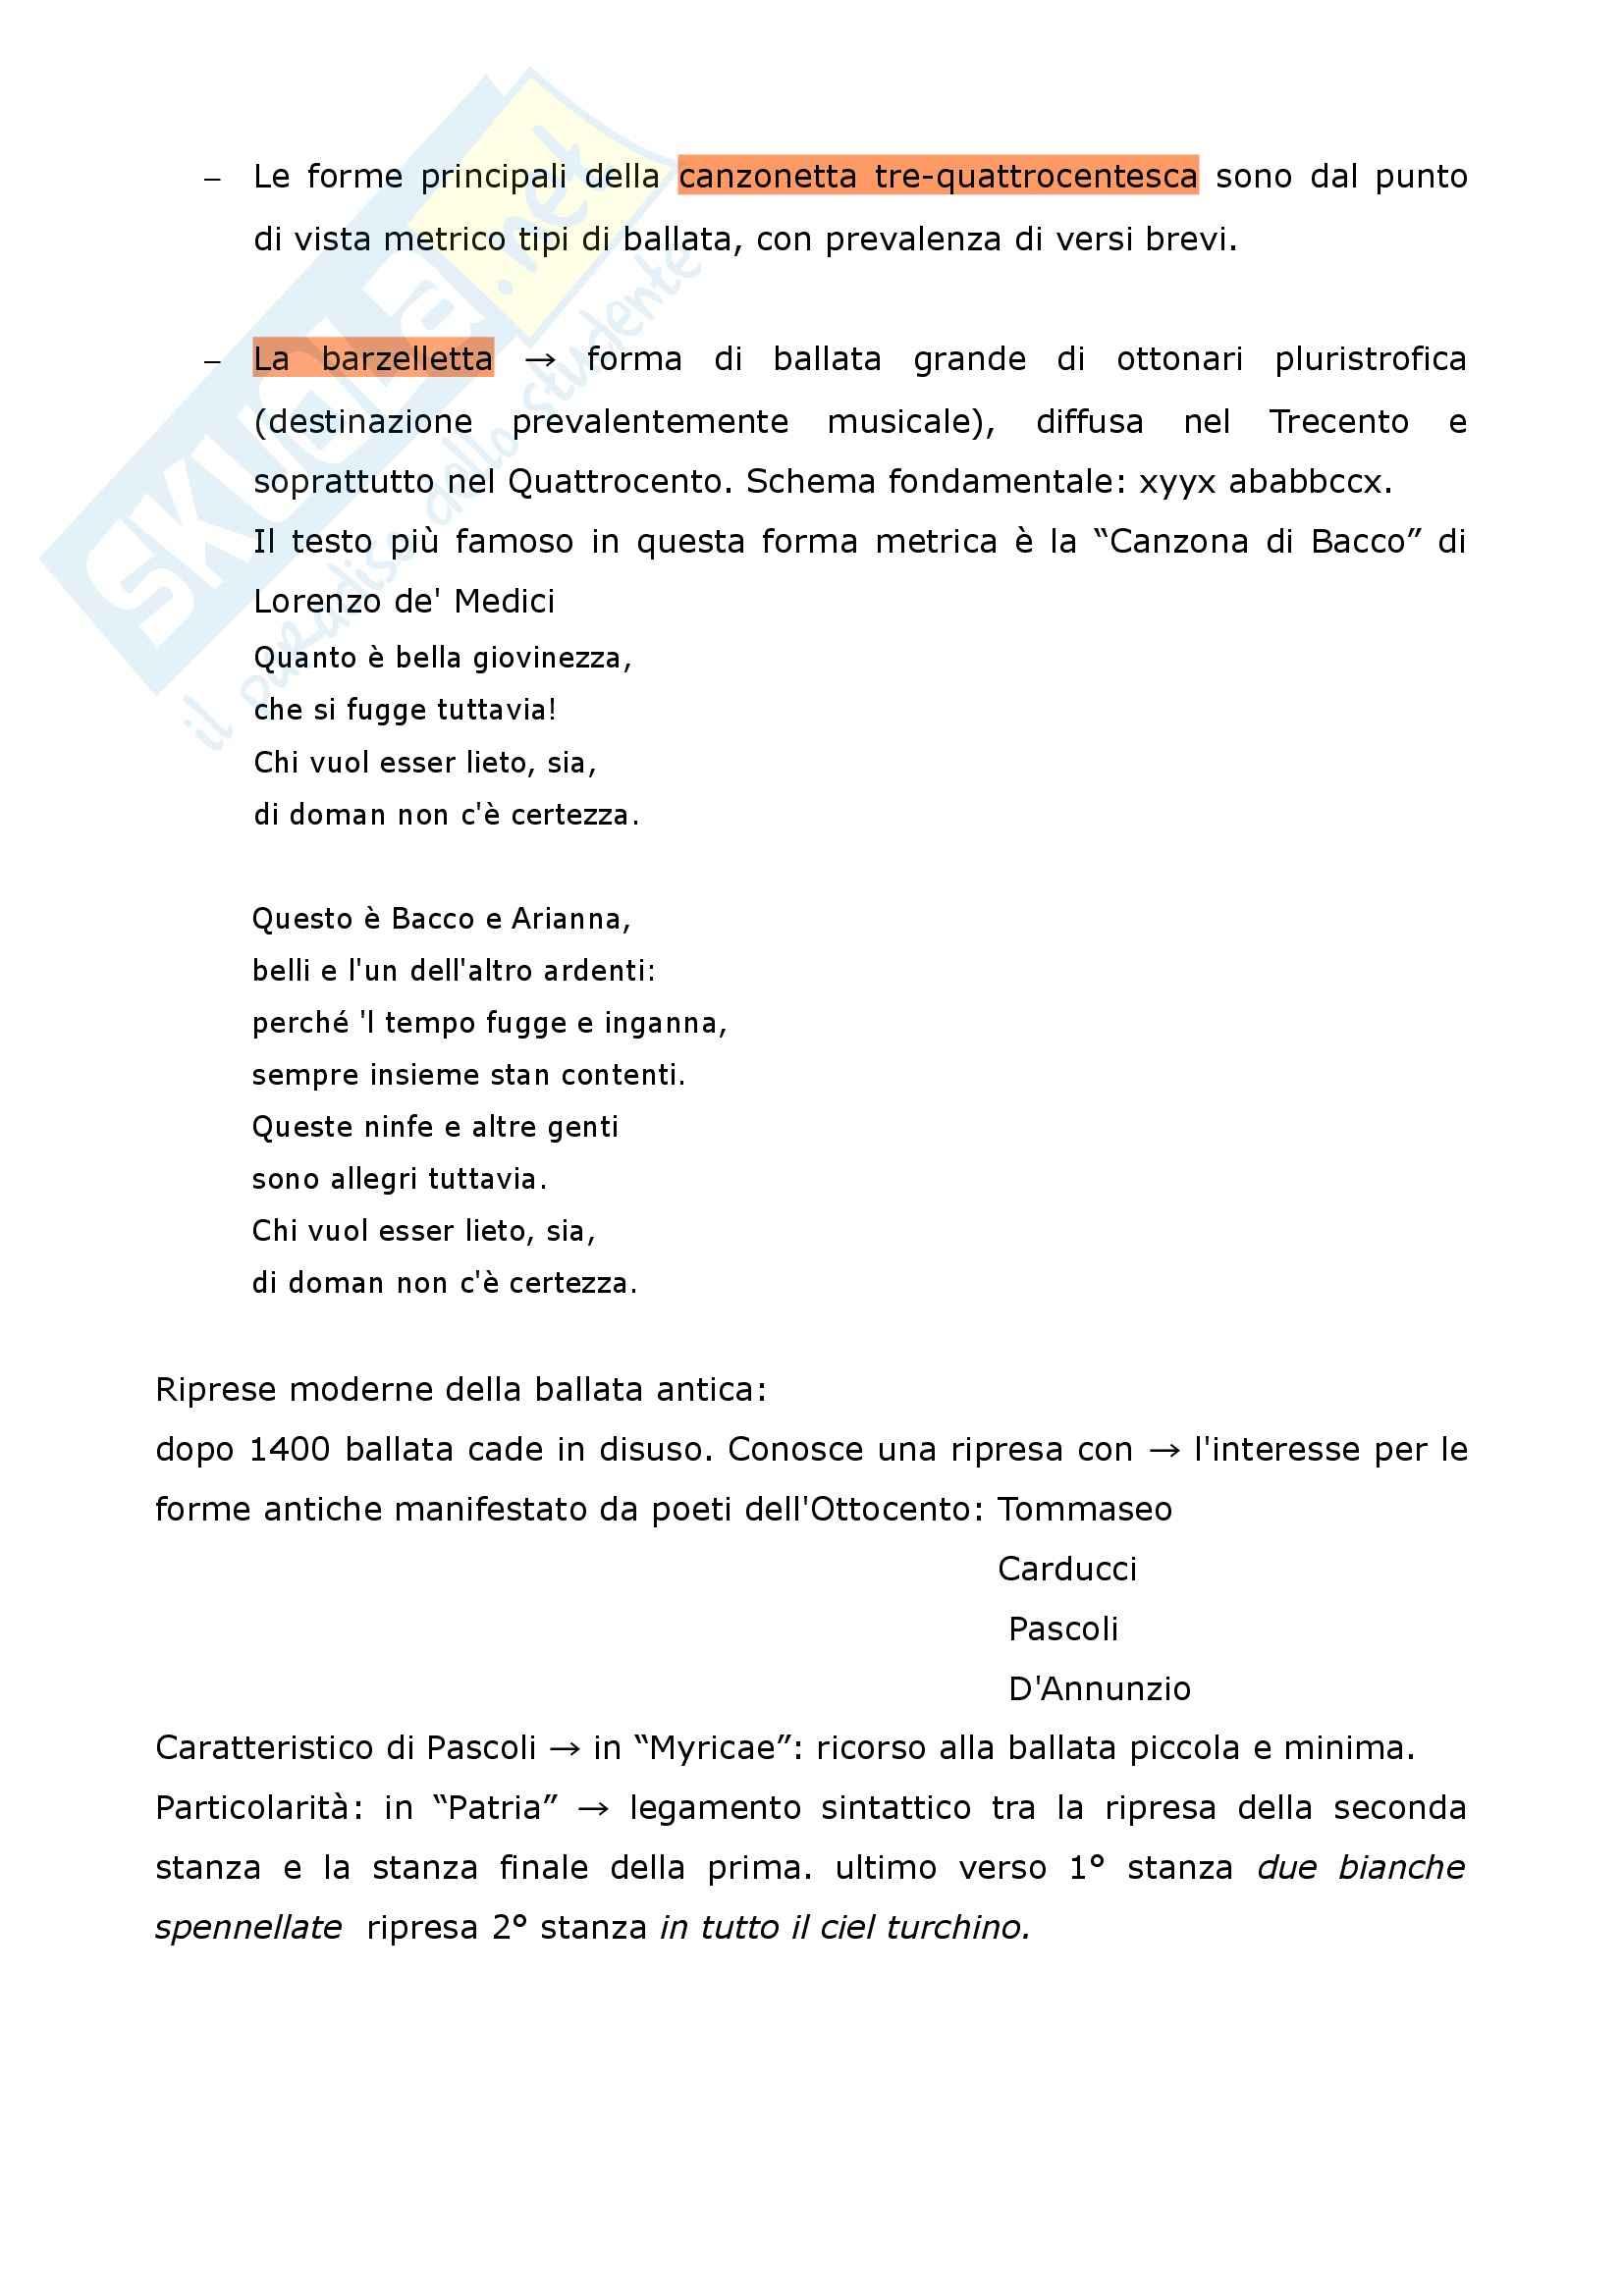 Riassunto esame Filologia italiana, La Metrica italiana, Beltrami, prof. Pancheri Pag. 21